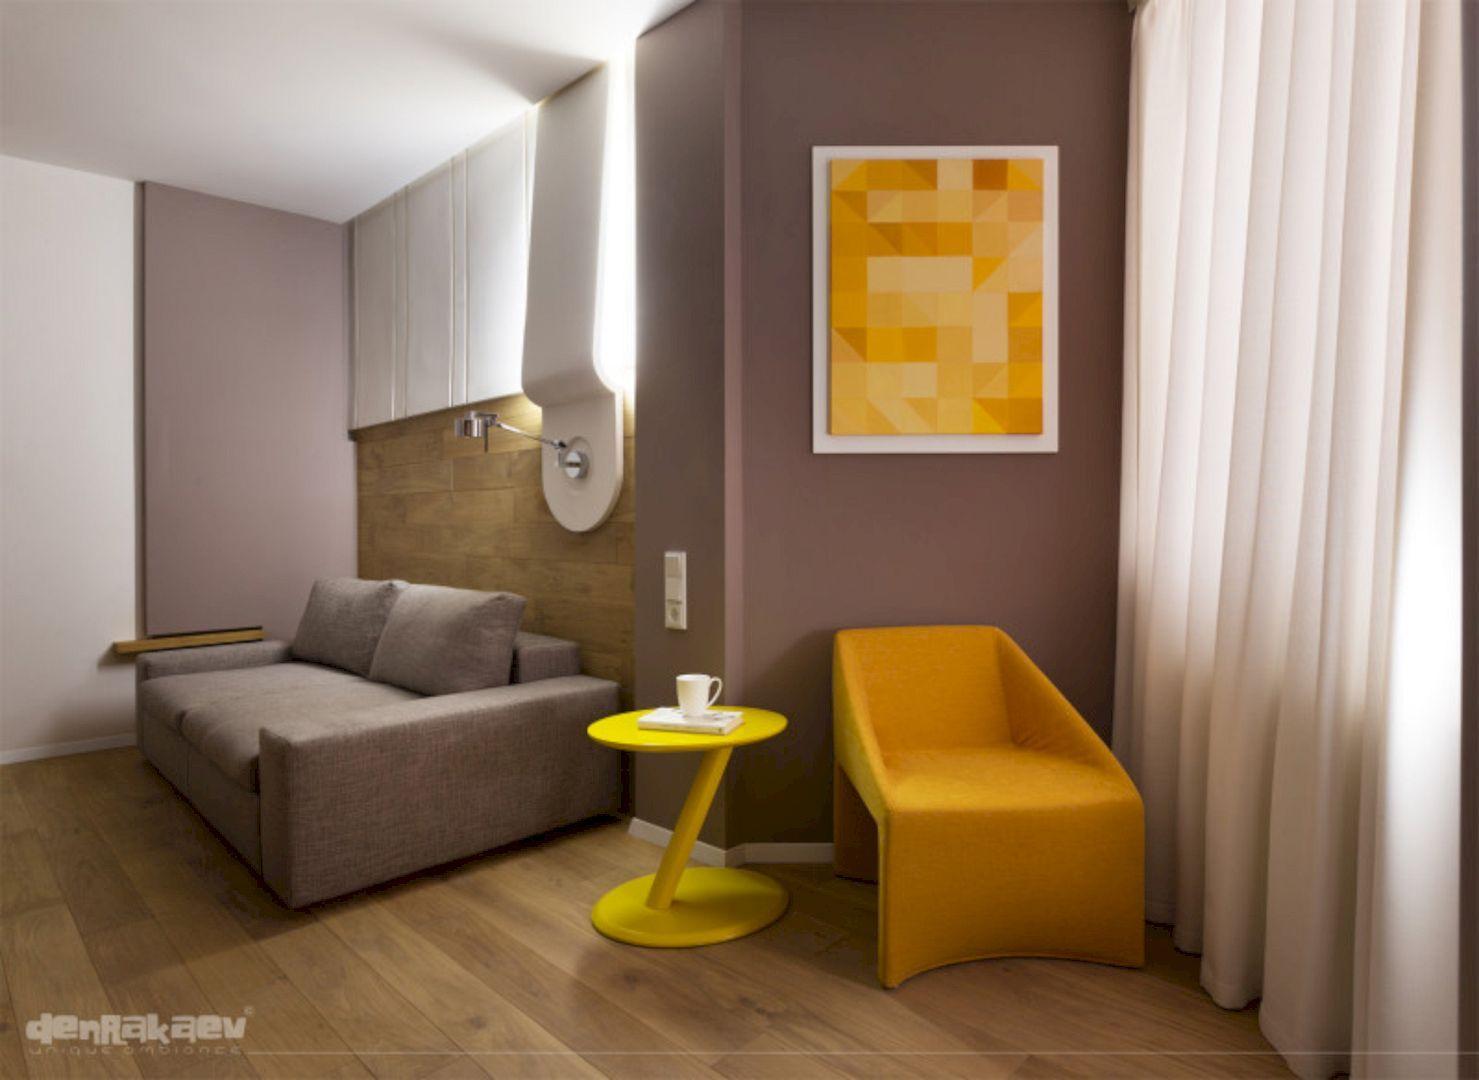 The futuristic apartment that Denis Rakaev created – Moon Box